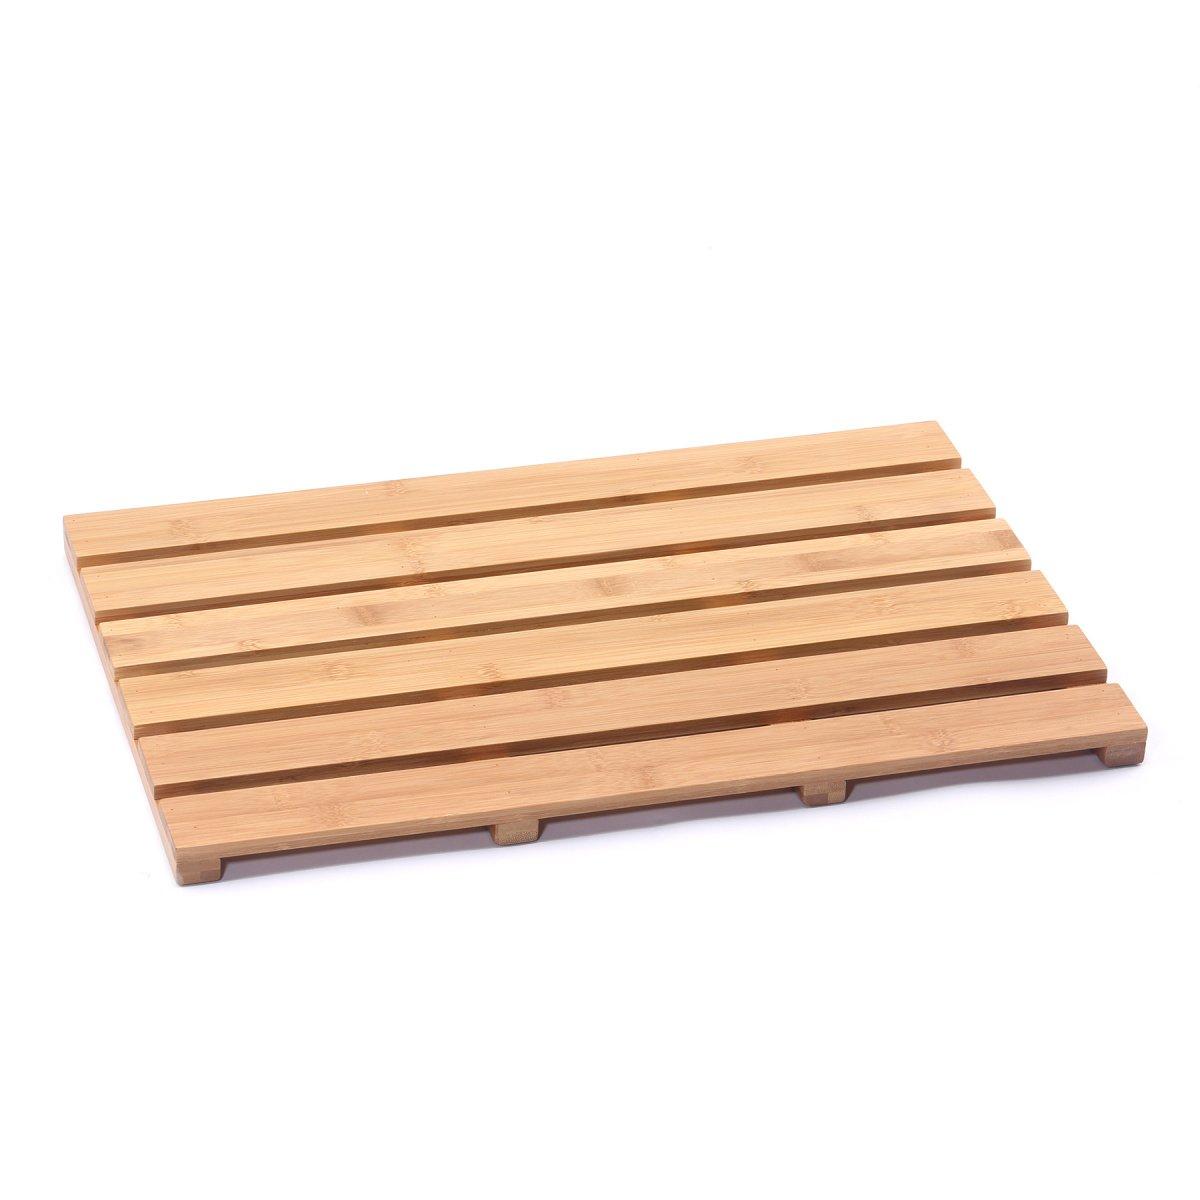 Musiclily Bamboo Bath Mat Skid-resistant Shower Floor Mat Bathroom Spa Non Slip Bathtub Mats Bathmat